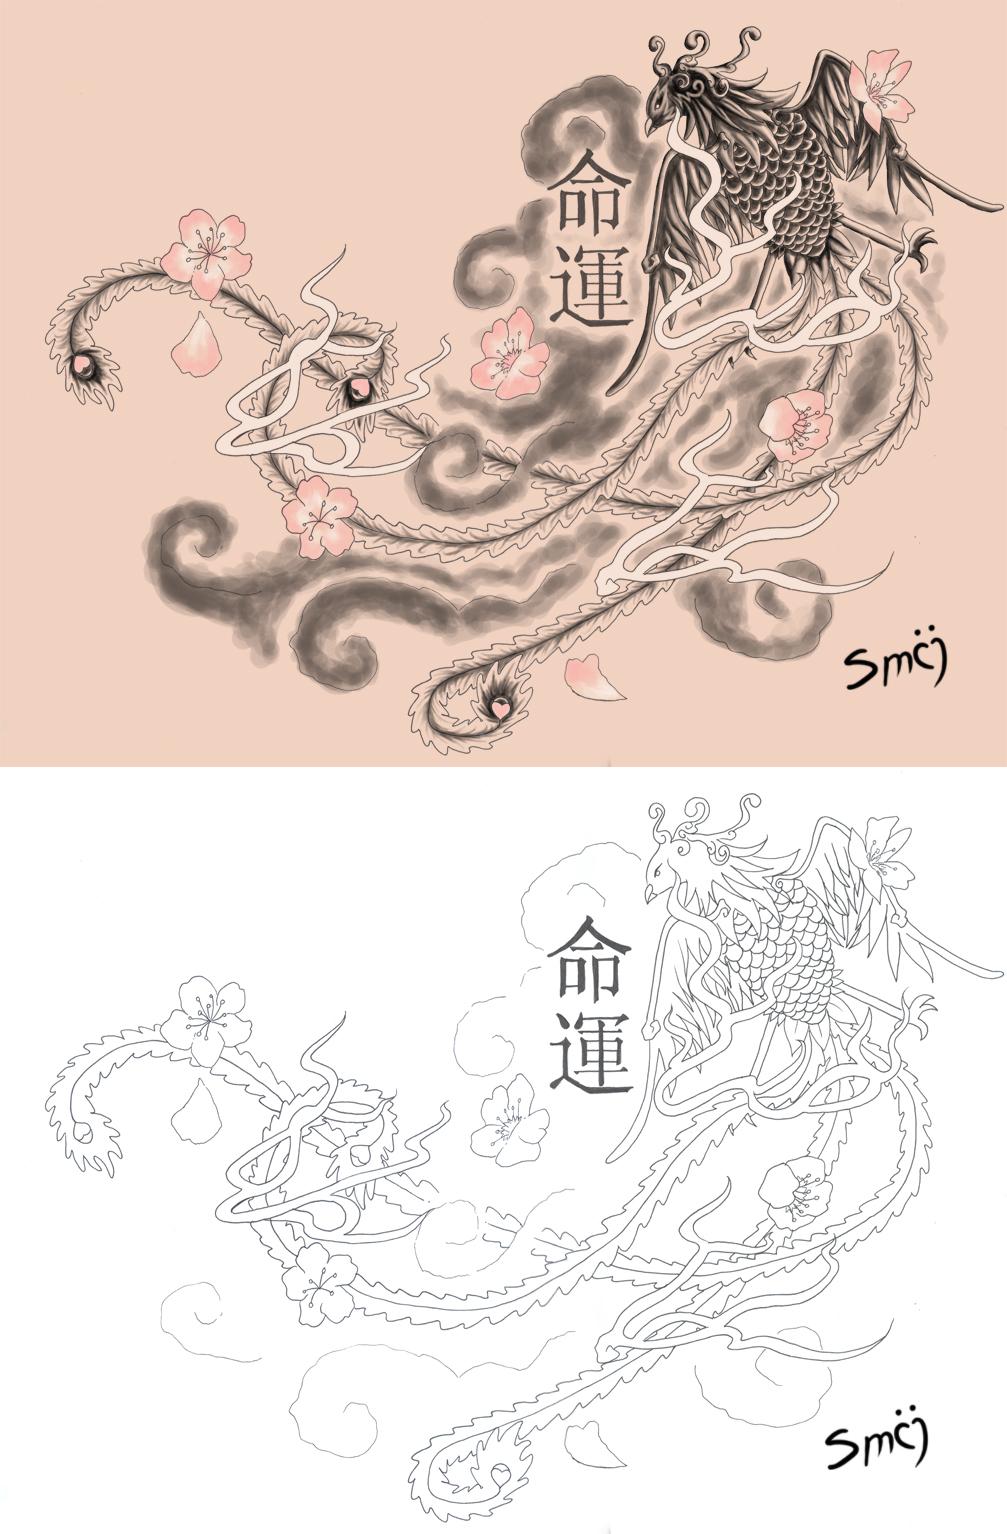 Kalabara Phoenix Tattoo by smij